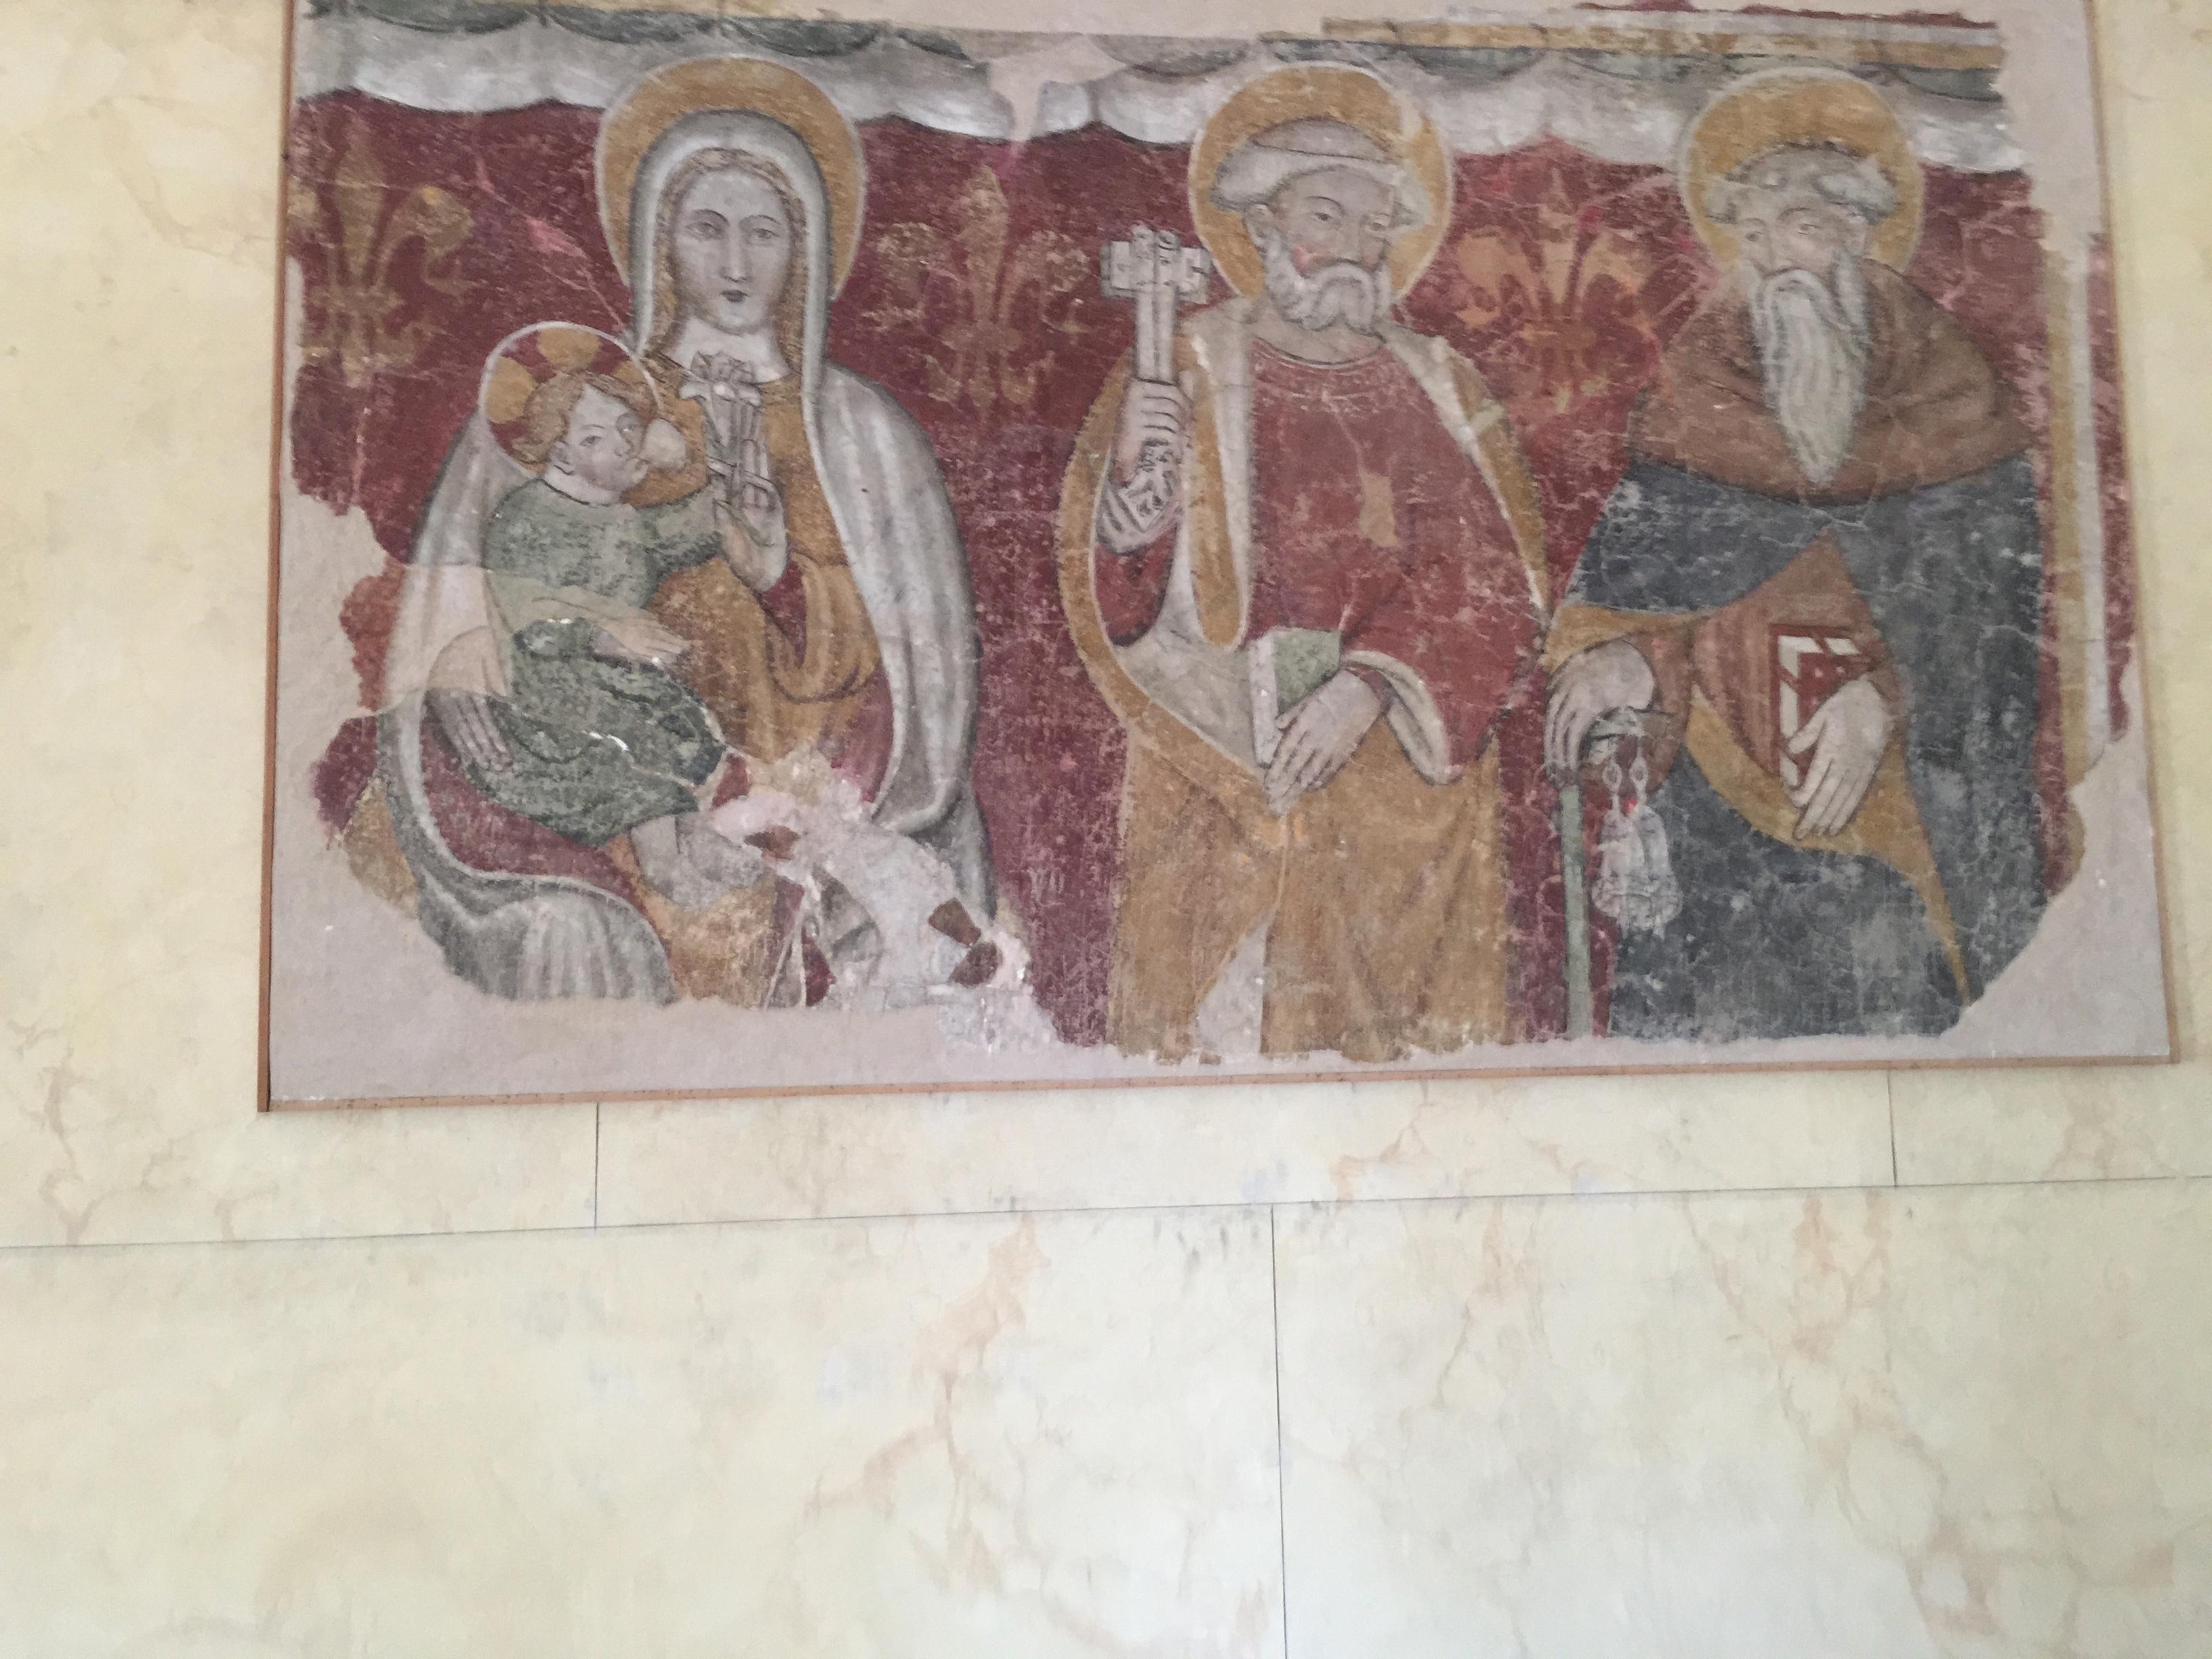 monast mural2